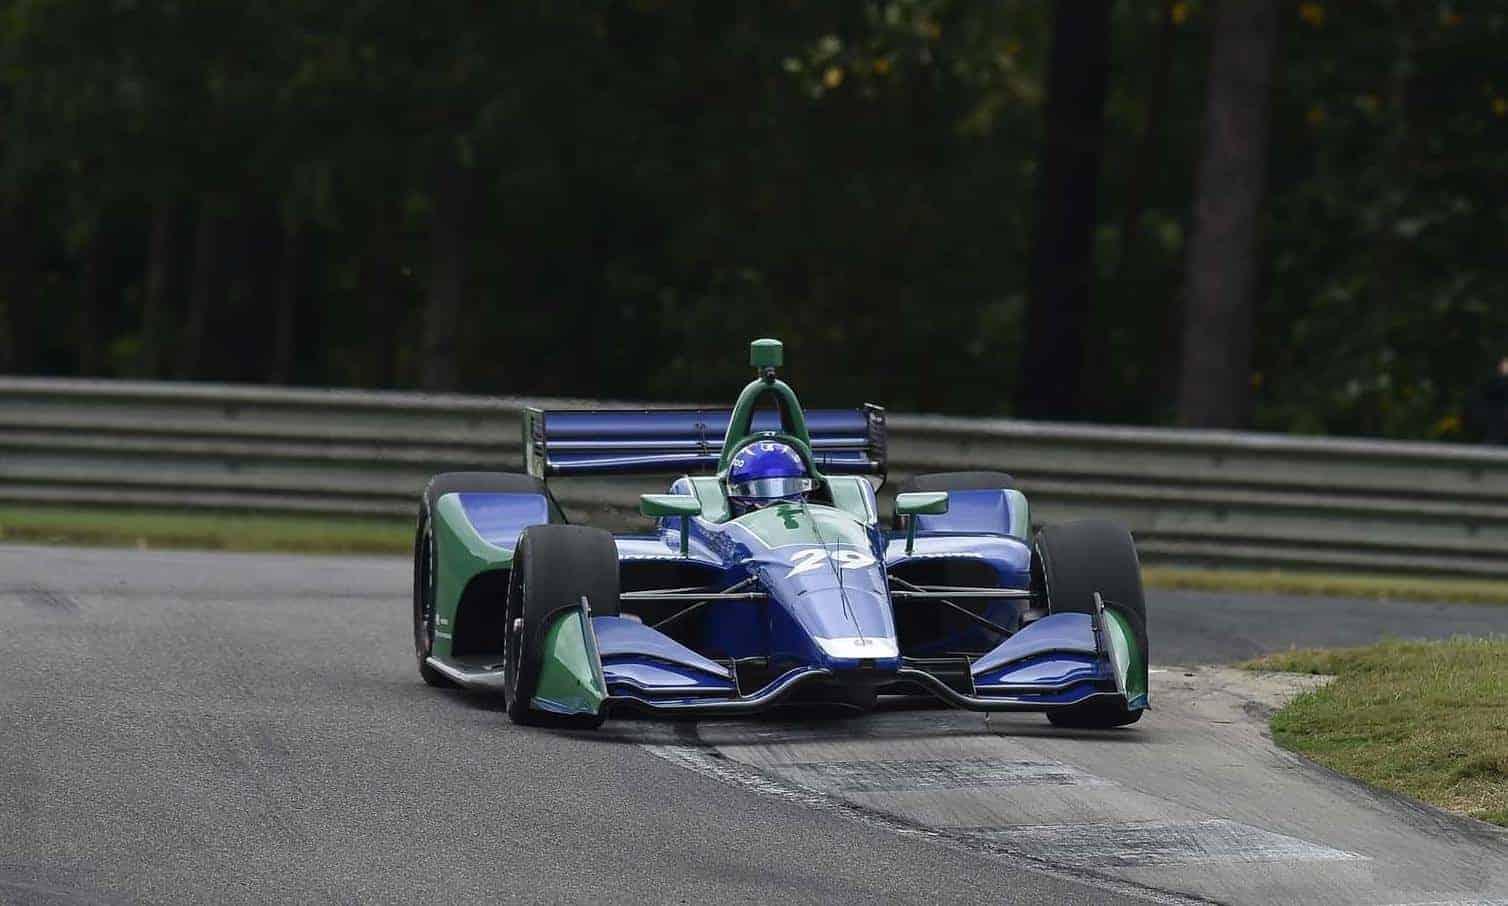 Alonso Indycar 2018 test Barber on the track on inside kerb Photo IndyCar